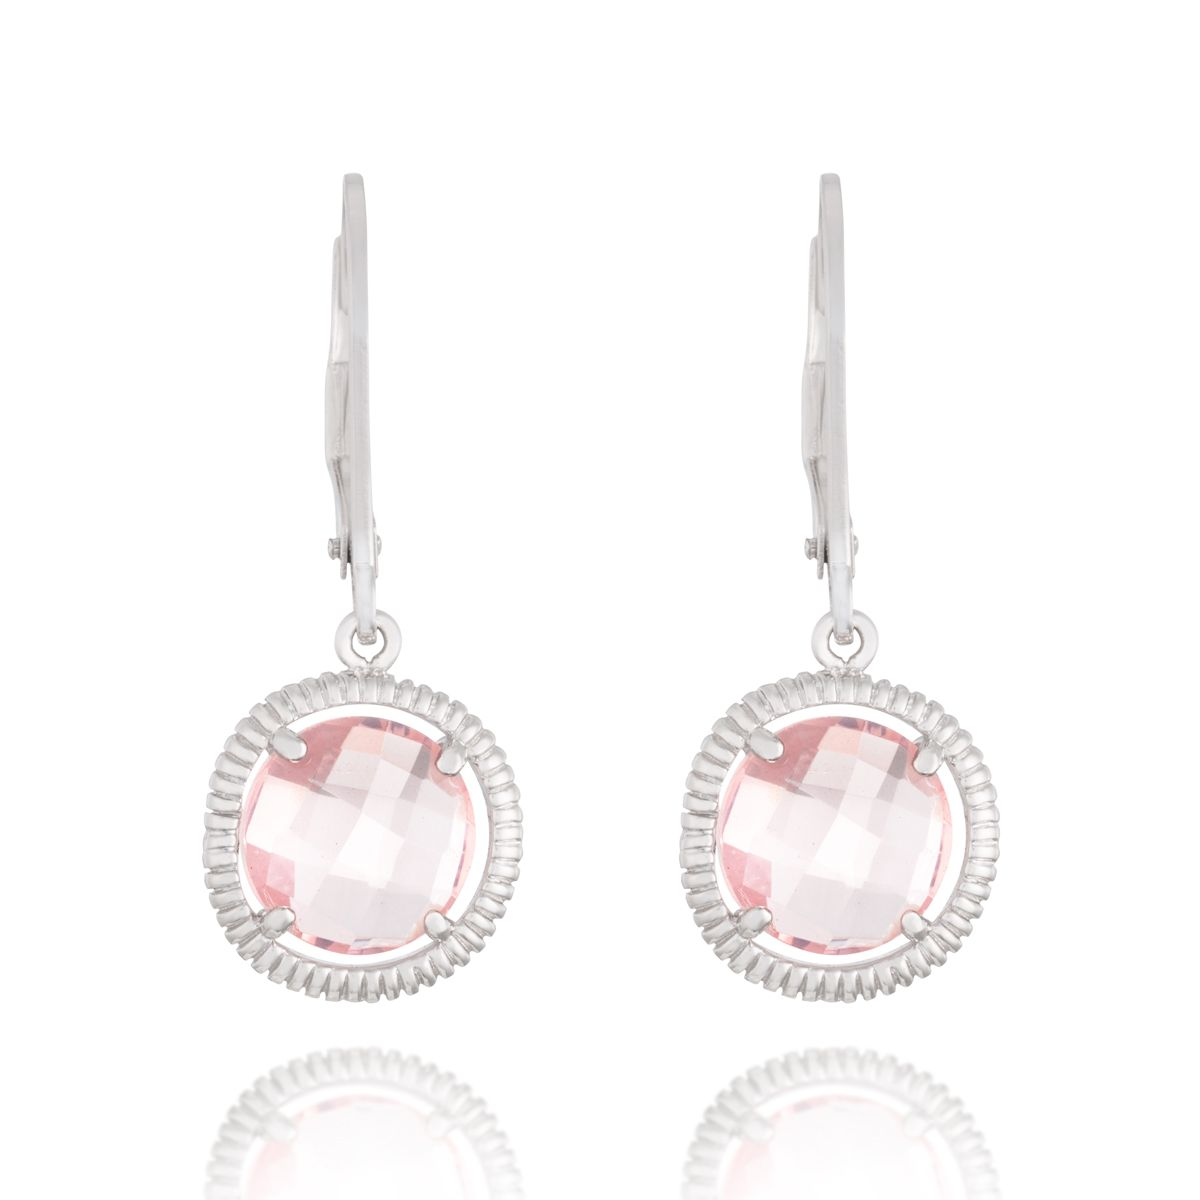 Brinco Prata e Quartzo Rosa Confete Prata